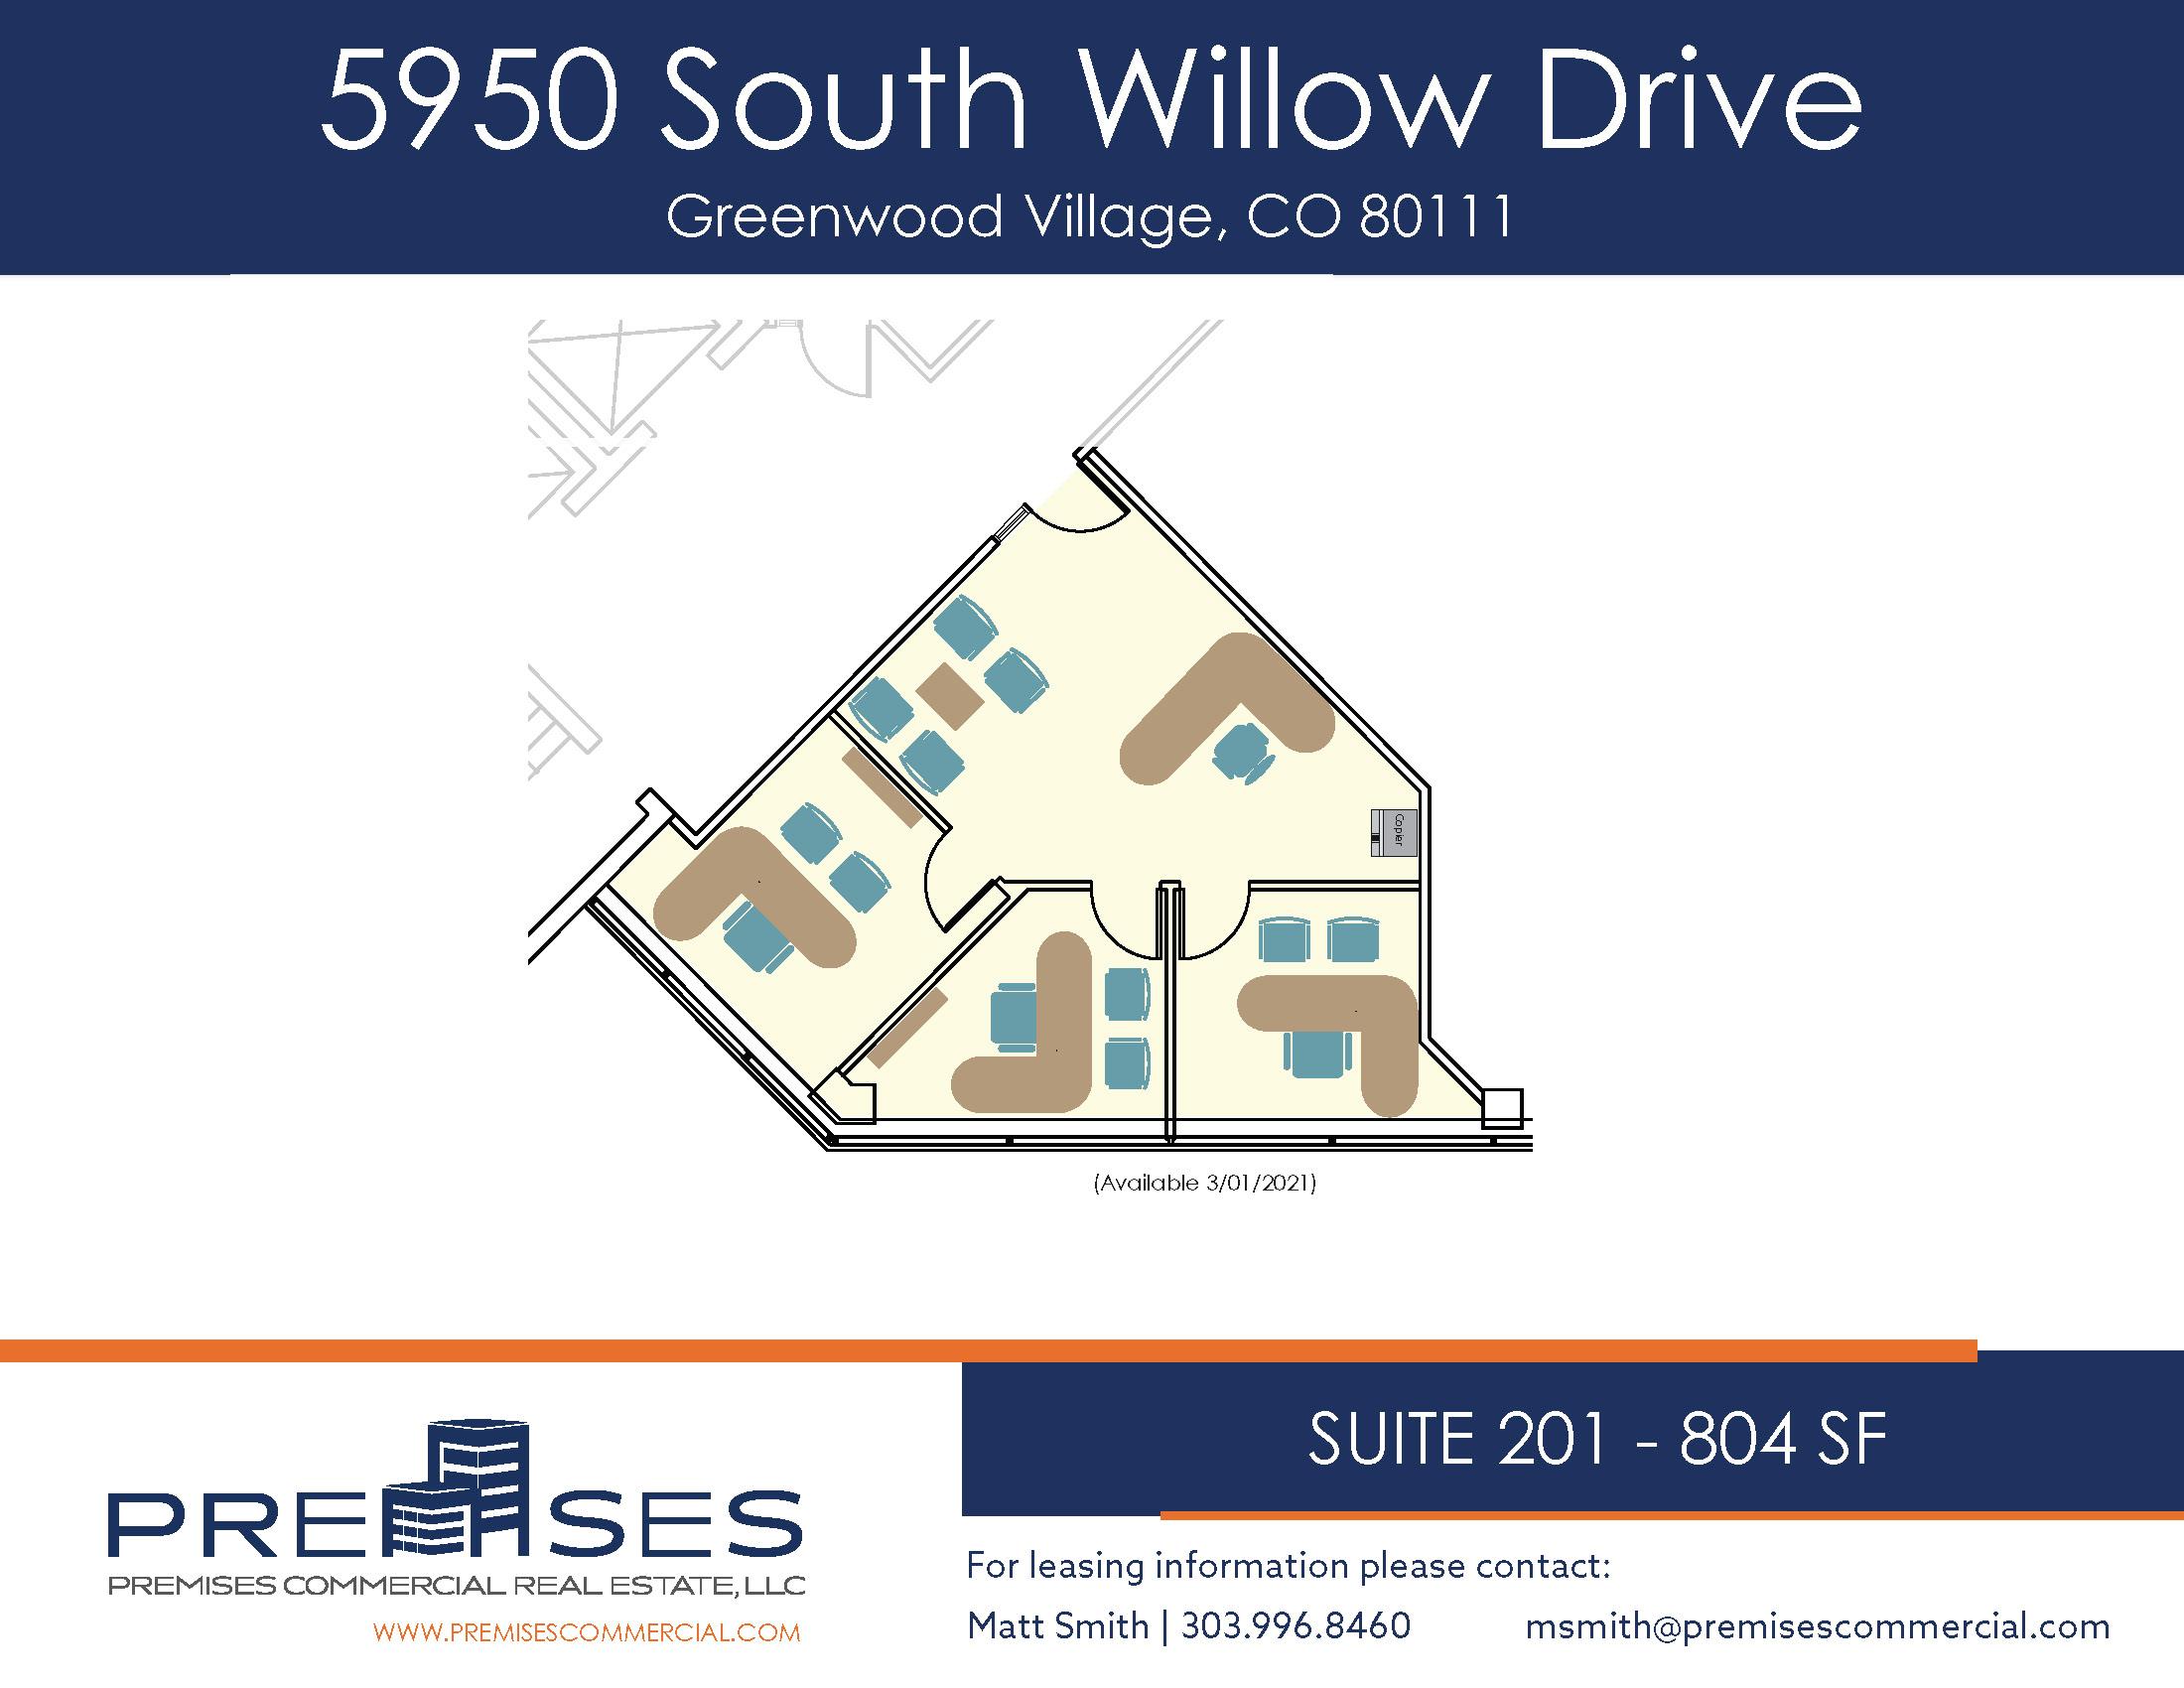 Suite 201 - 804 sf